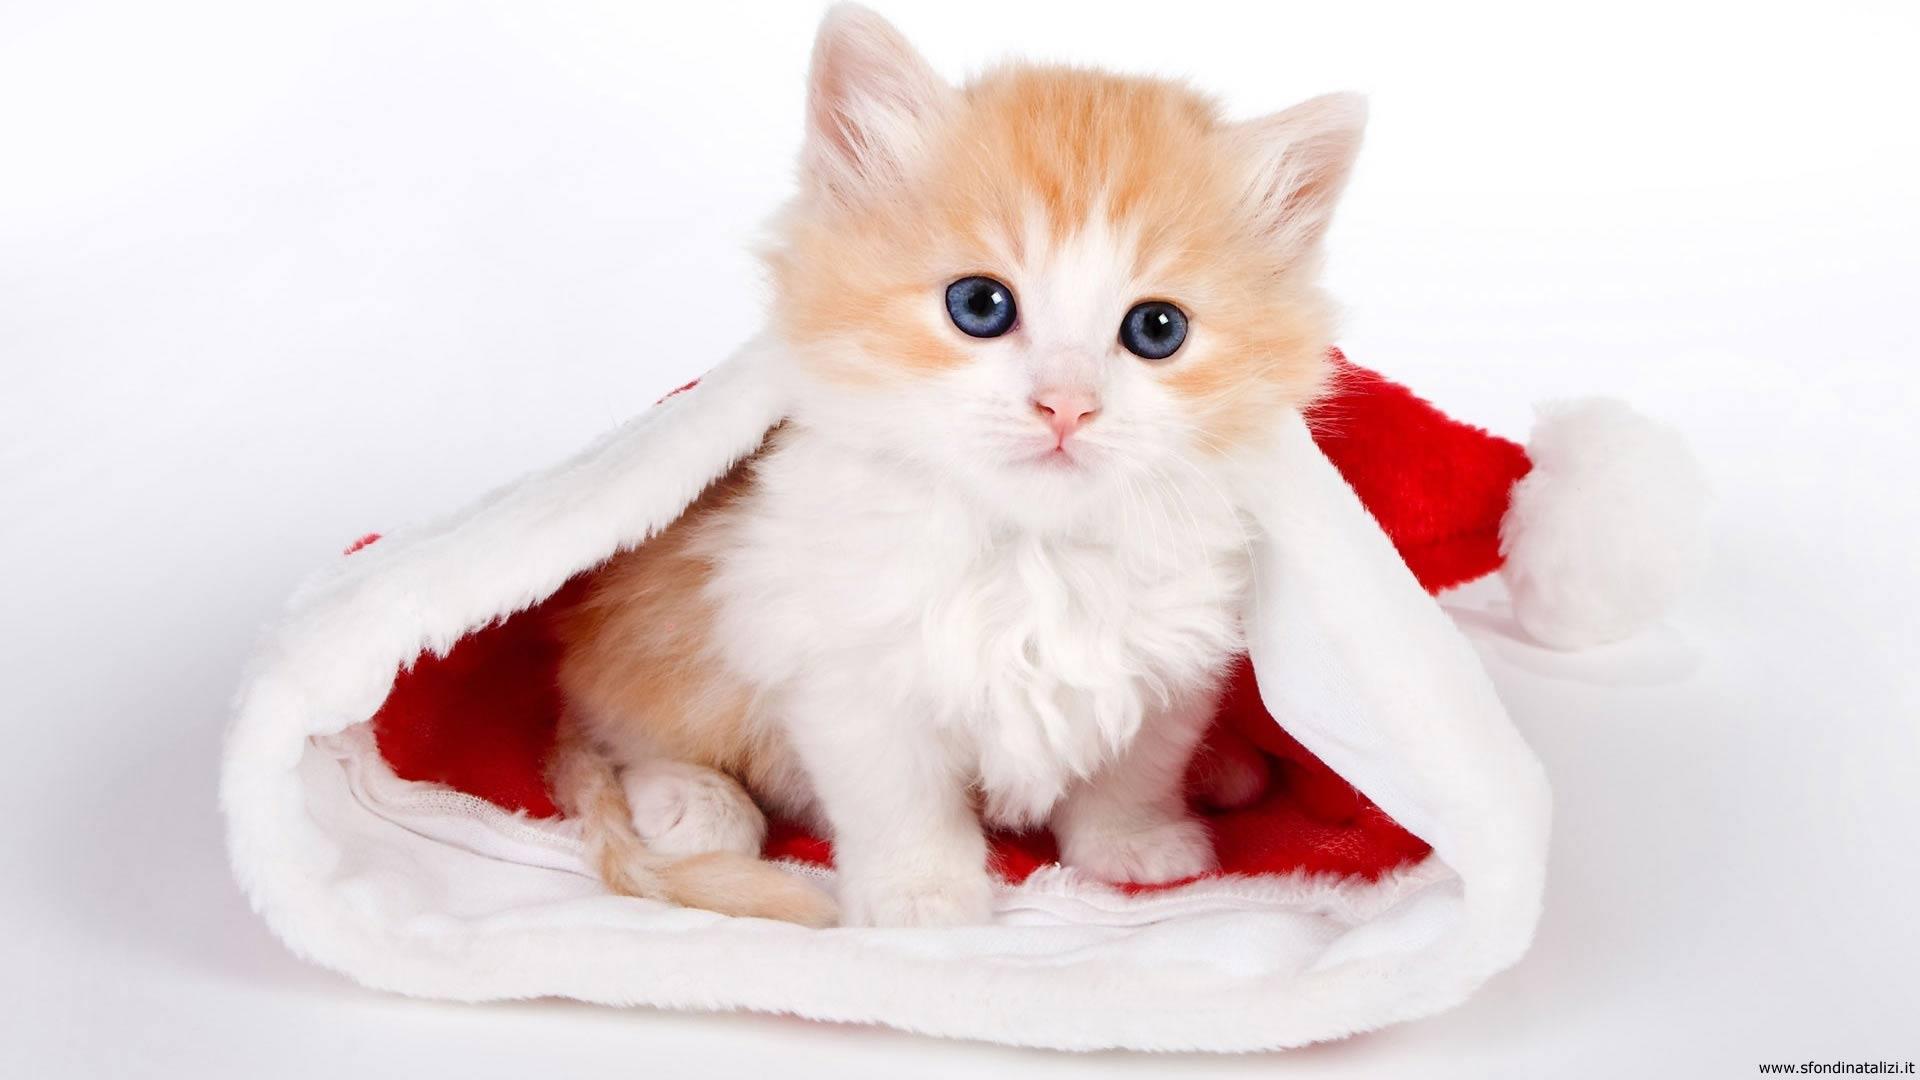 Sfondo Natalizio - Sfondo desktop Gattino di Natale